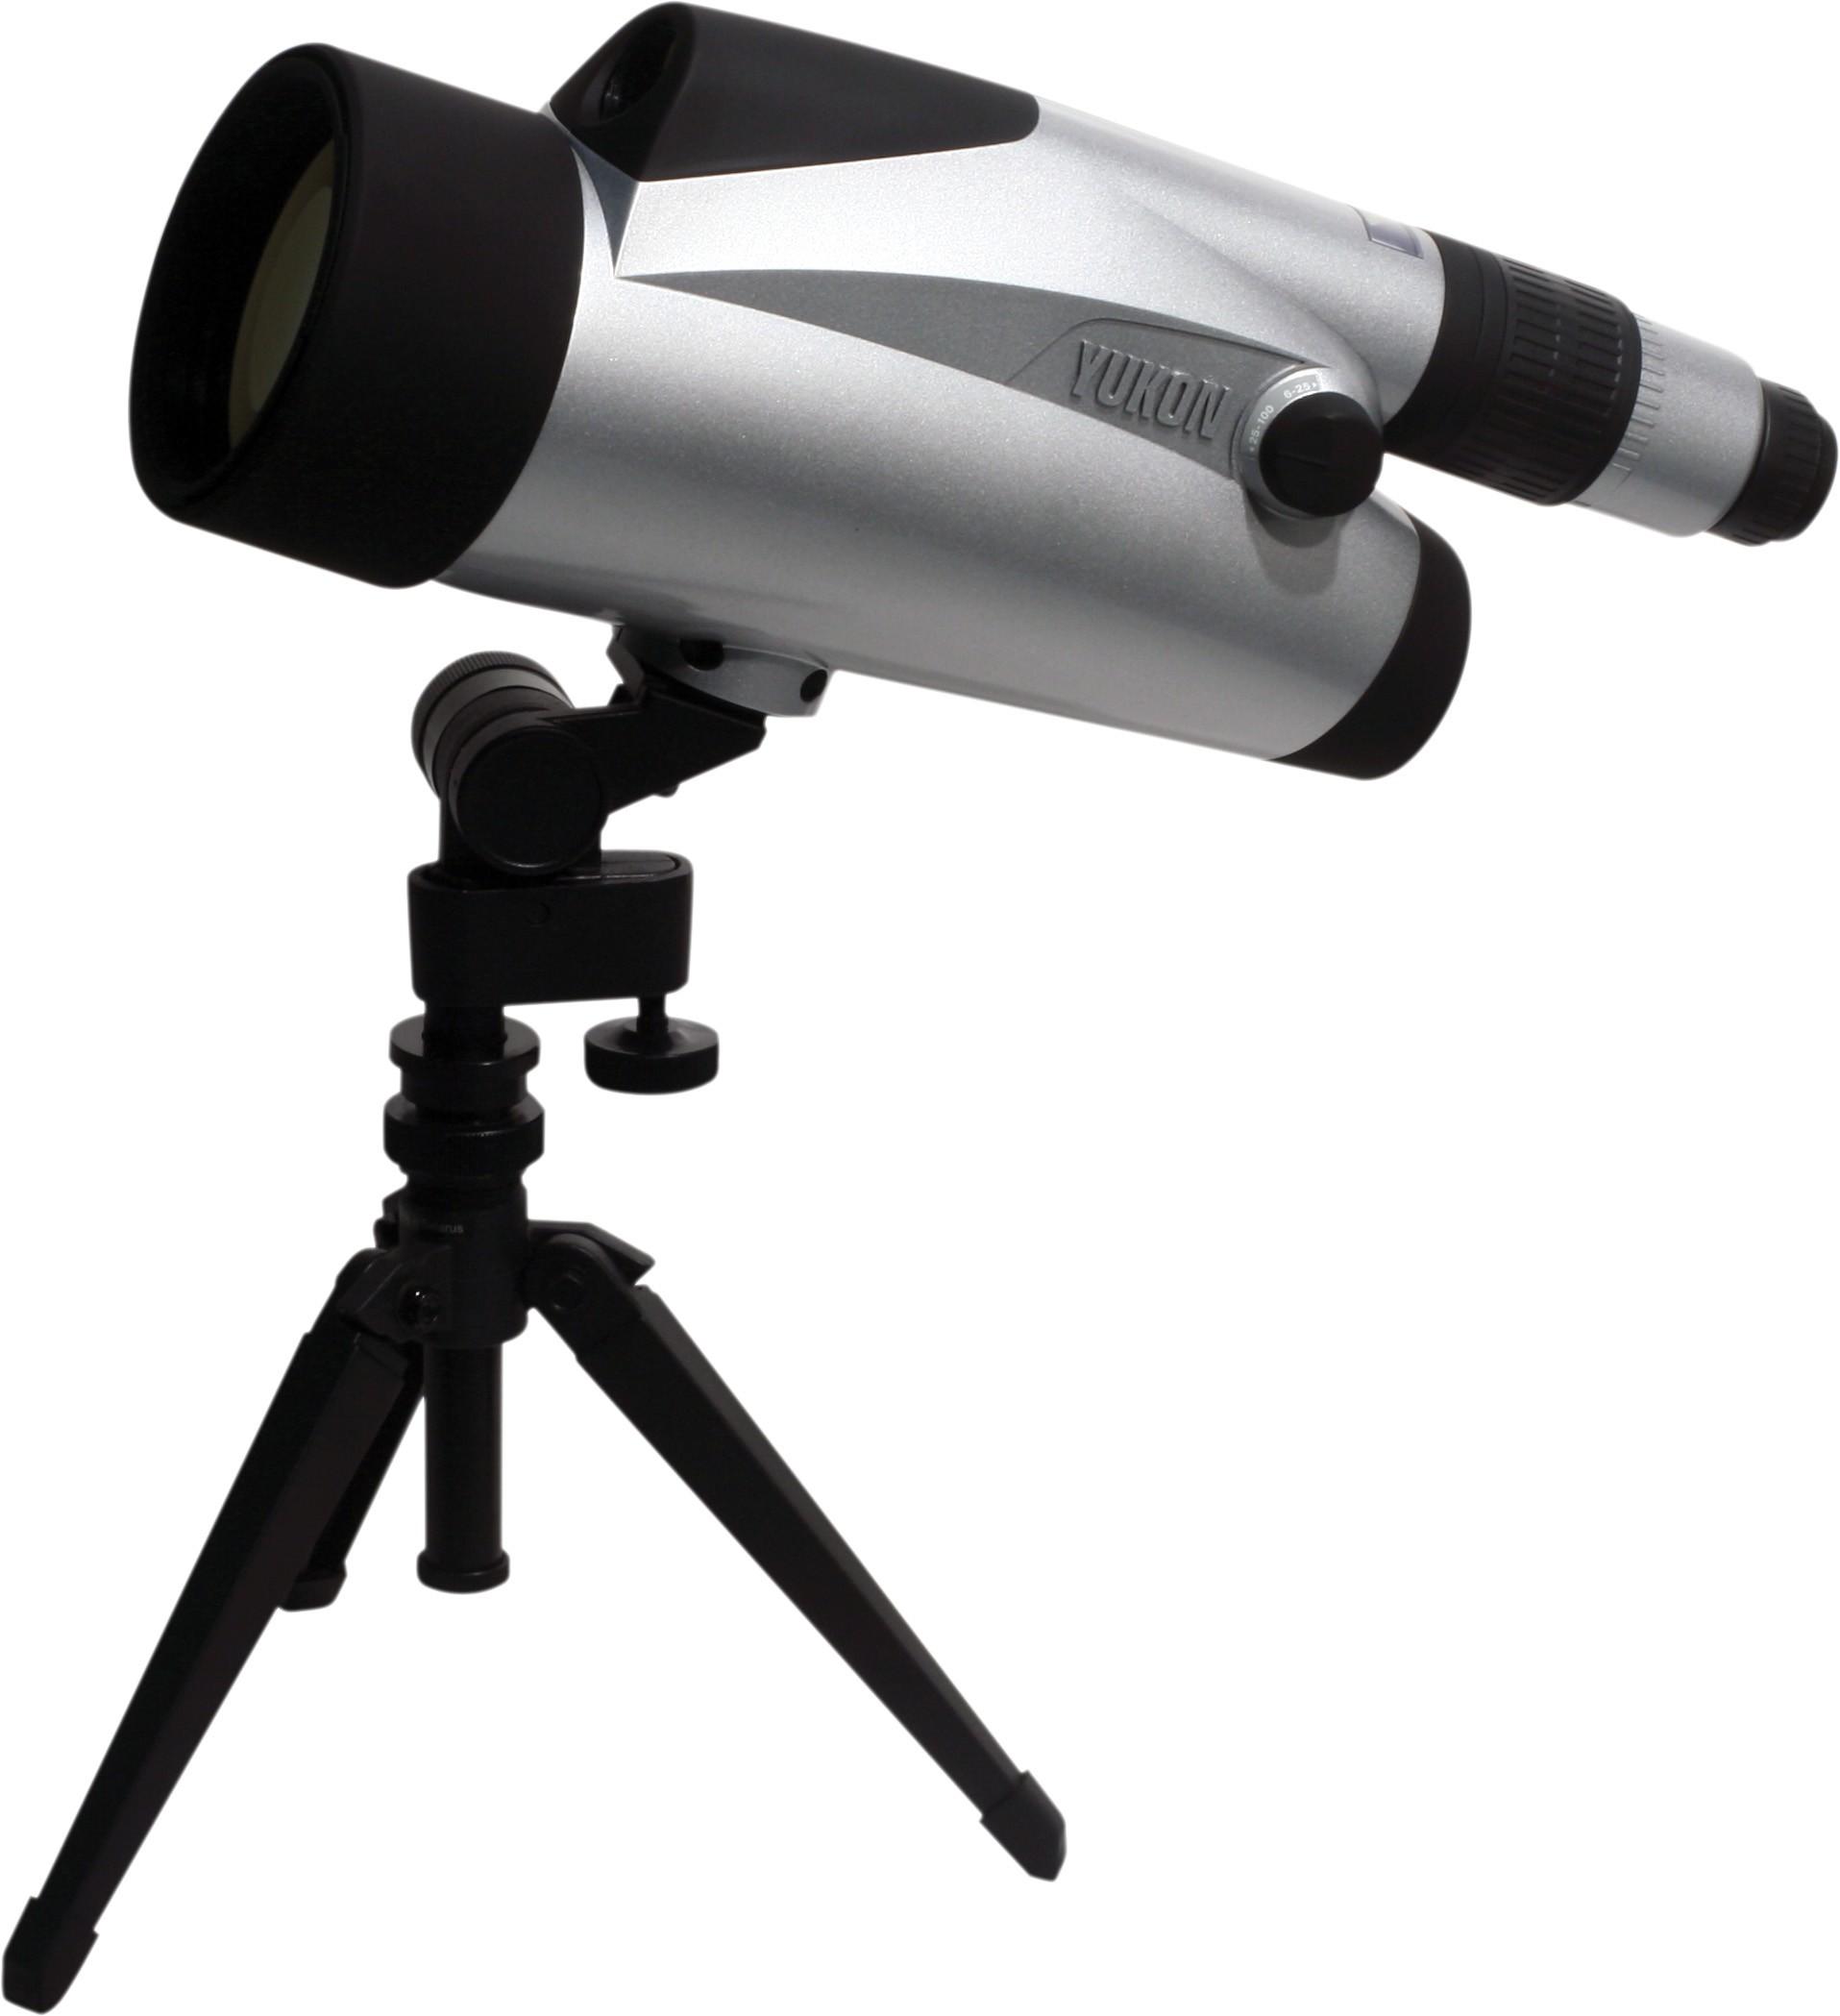 Yukon 100X LT 6-100x100mm Variofocal ZOOM SpottingScope KIT - CLEARANCE